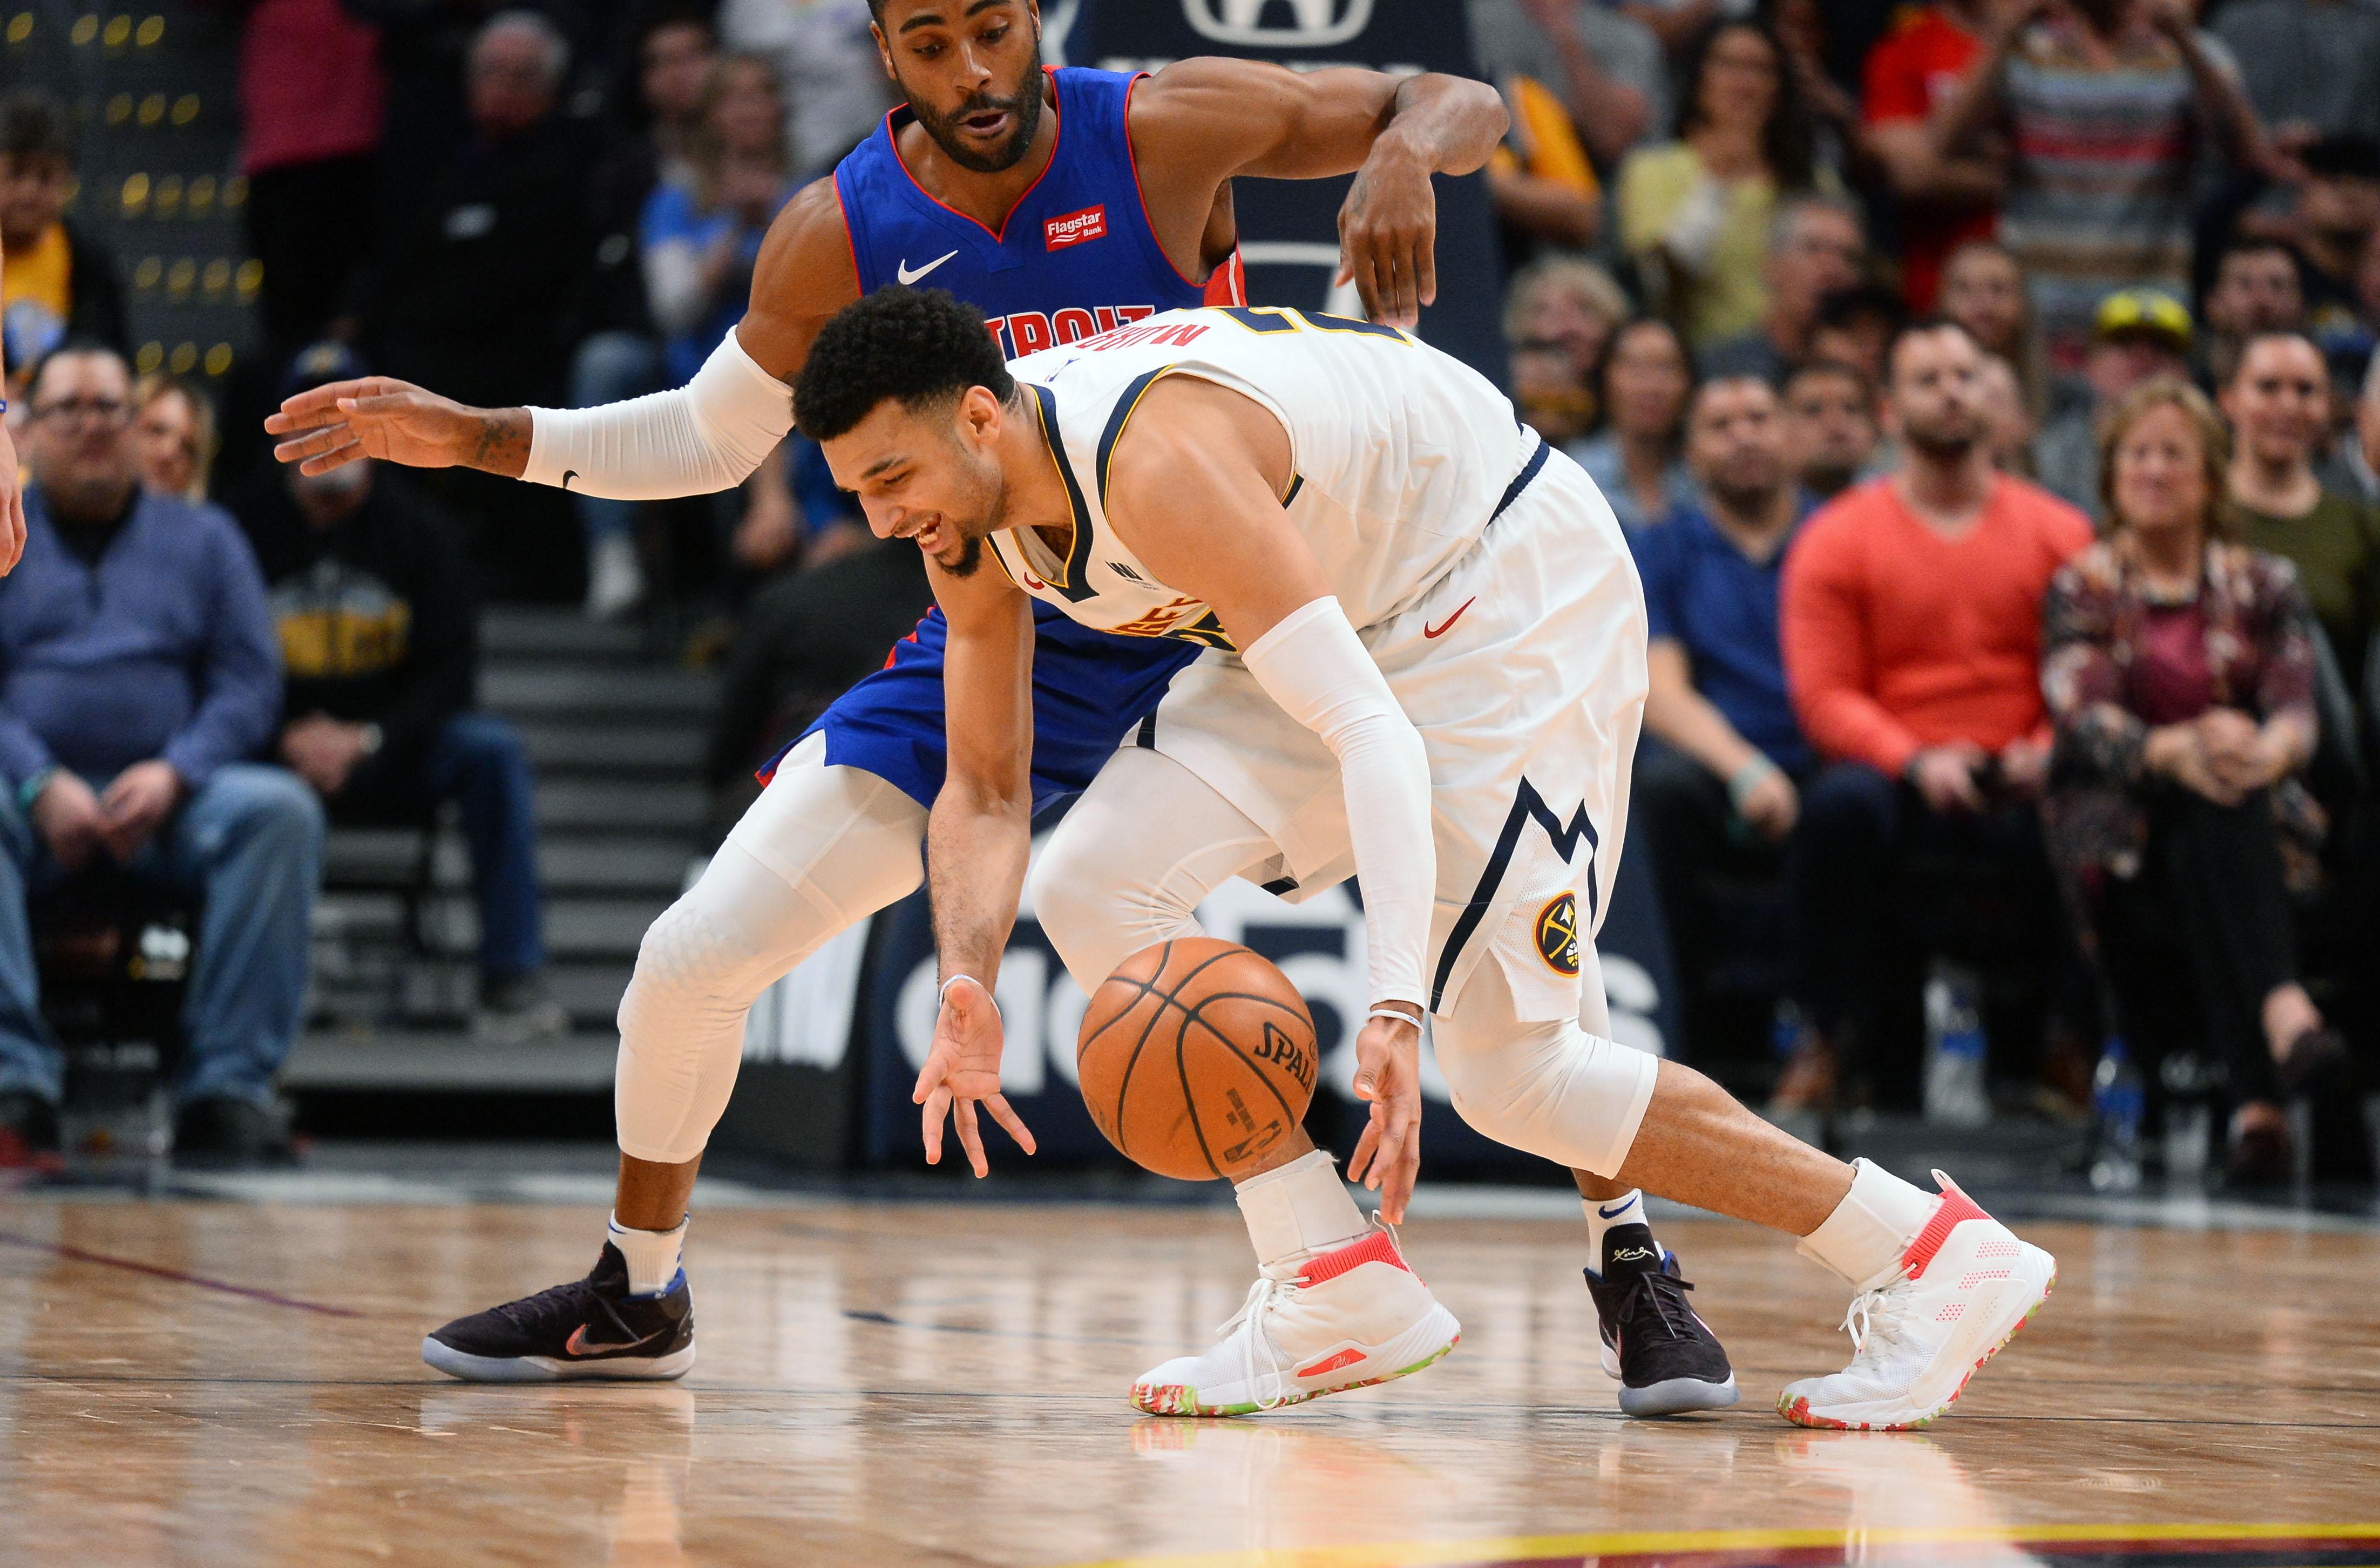 Detroit Pistons guard Wayne Ellington (top) pressures Denver Nuggets guard Jamal Murray (27) in the second half at the Pepsi Center.